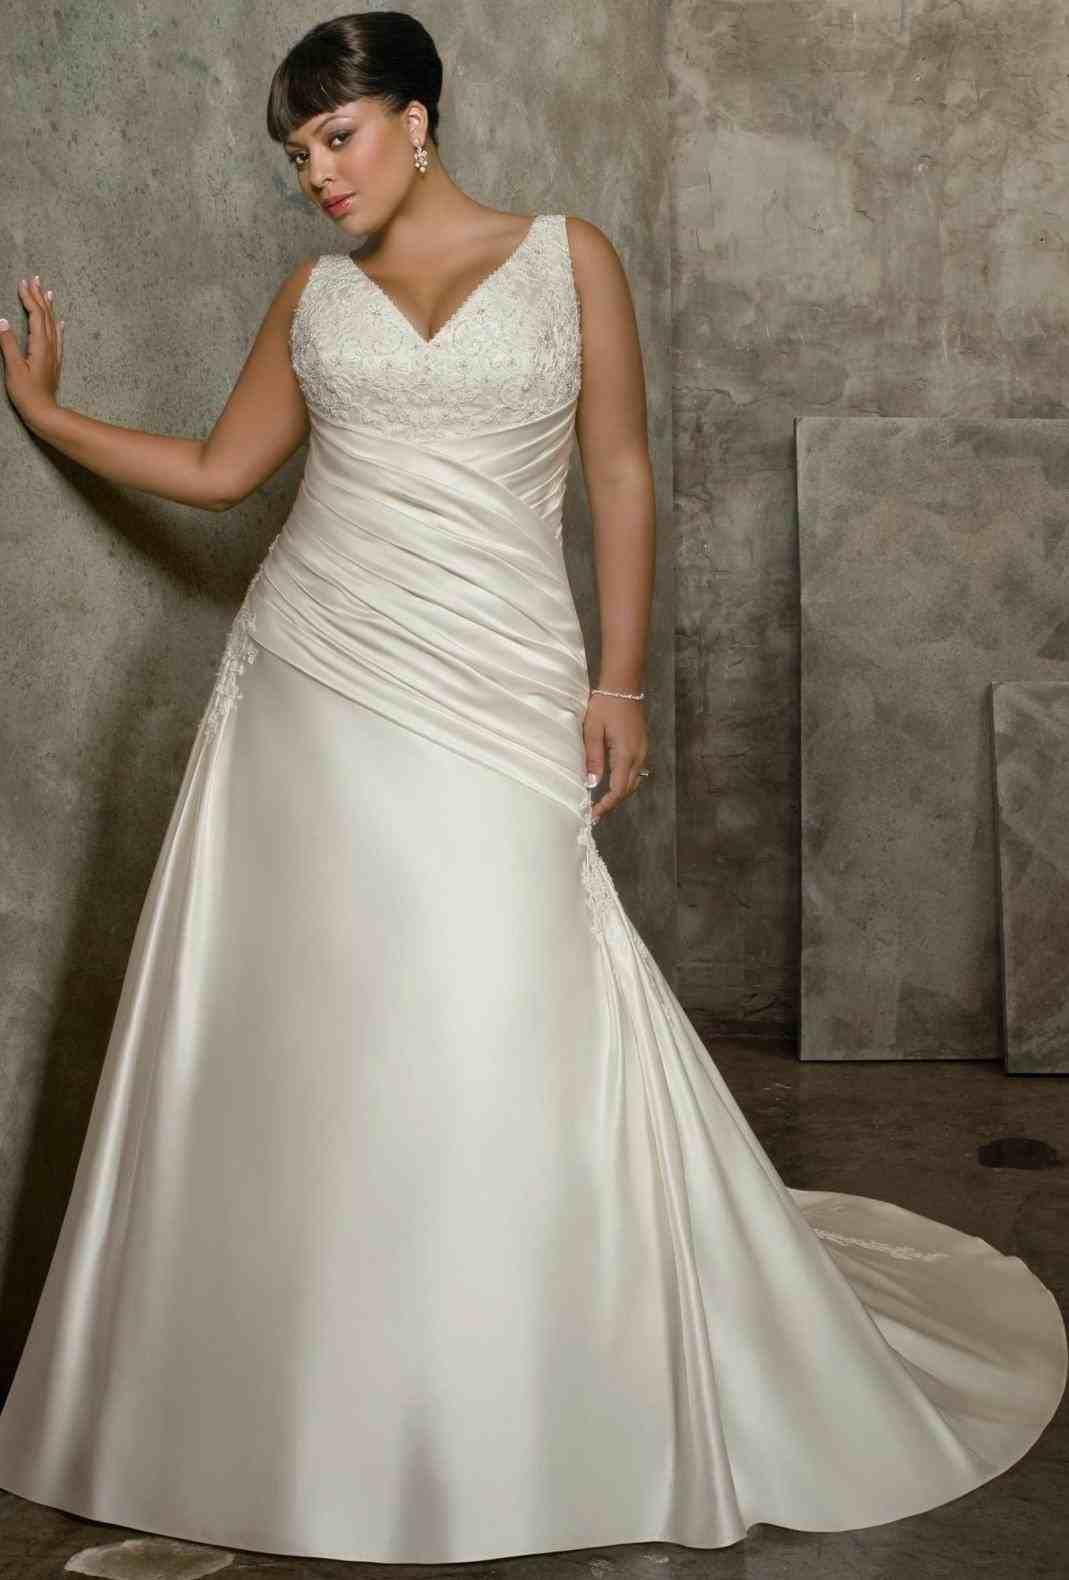 plus size western wedding dresses | Wedding dresses nyc ...